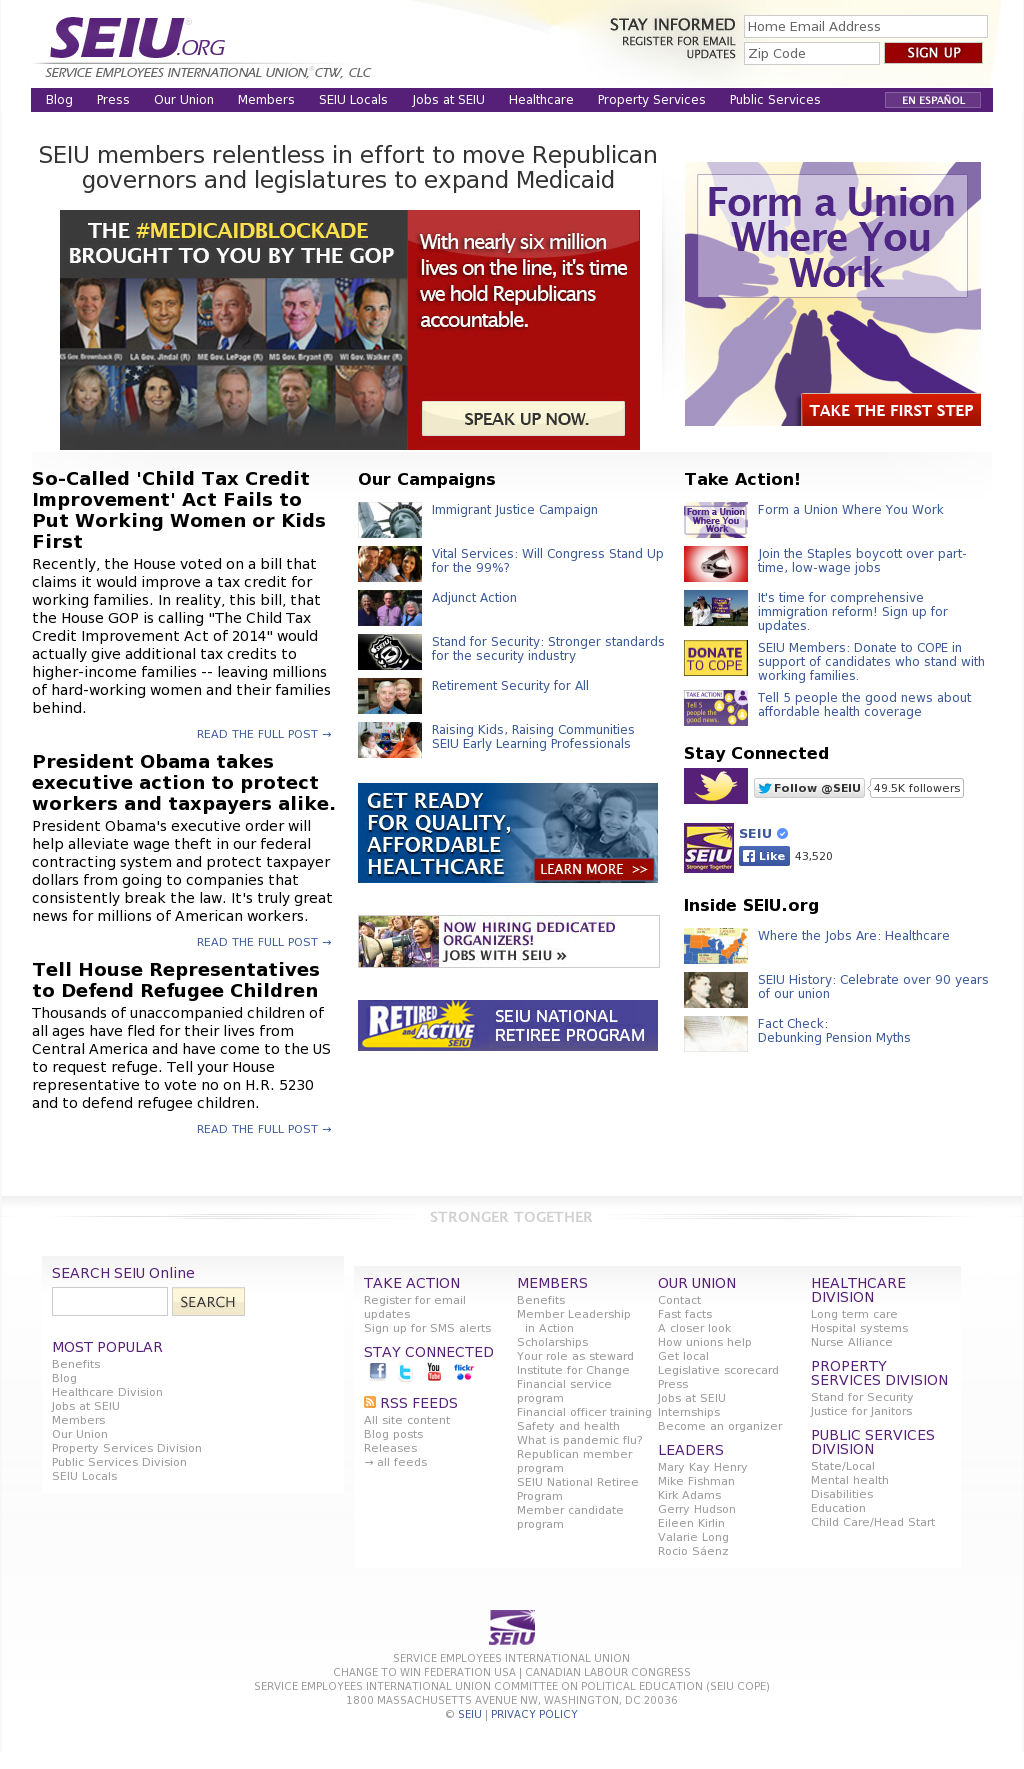 SEIU Competitors, Revenue and Employees - Owler Company Profile